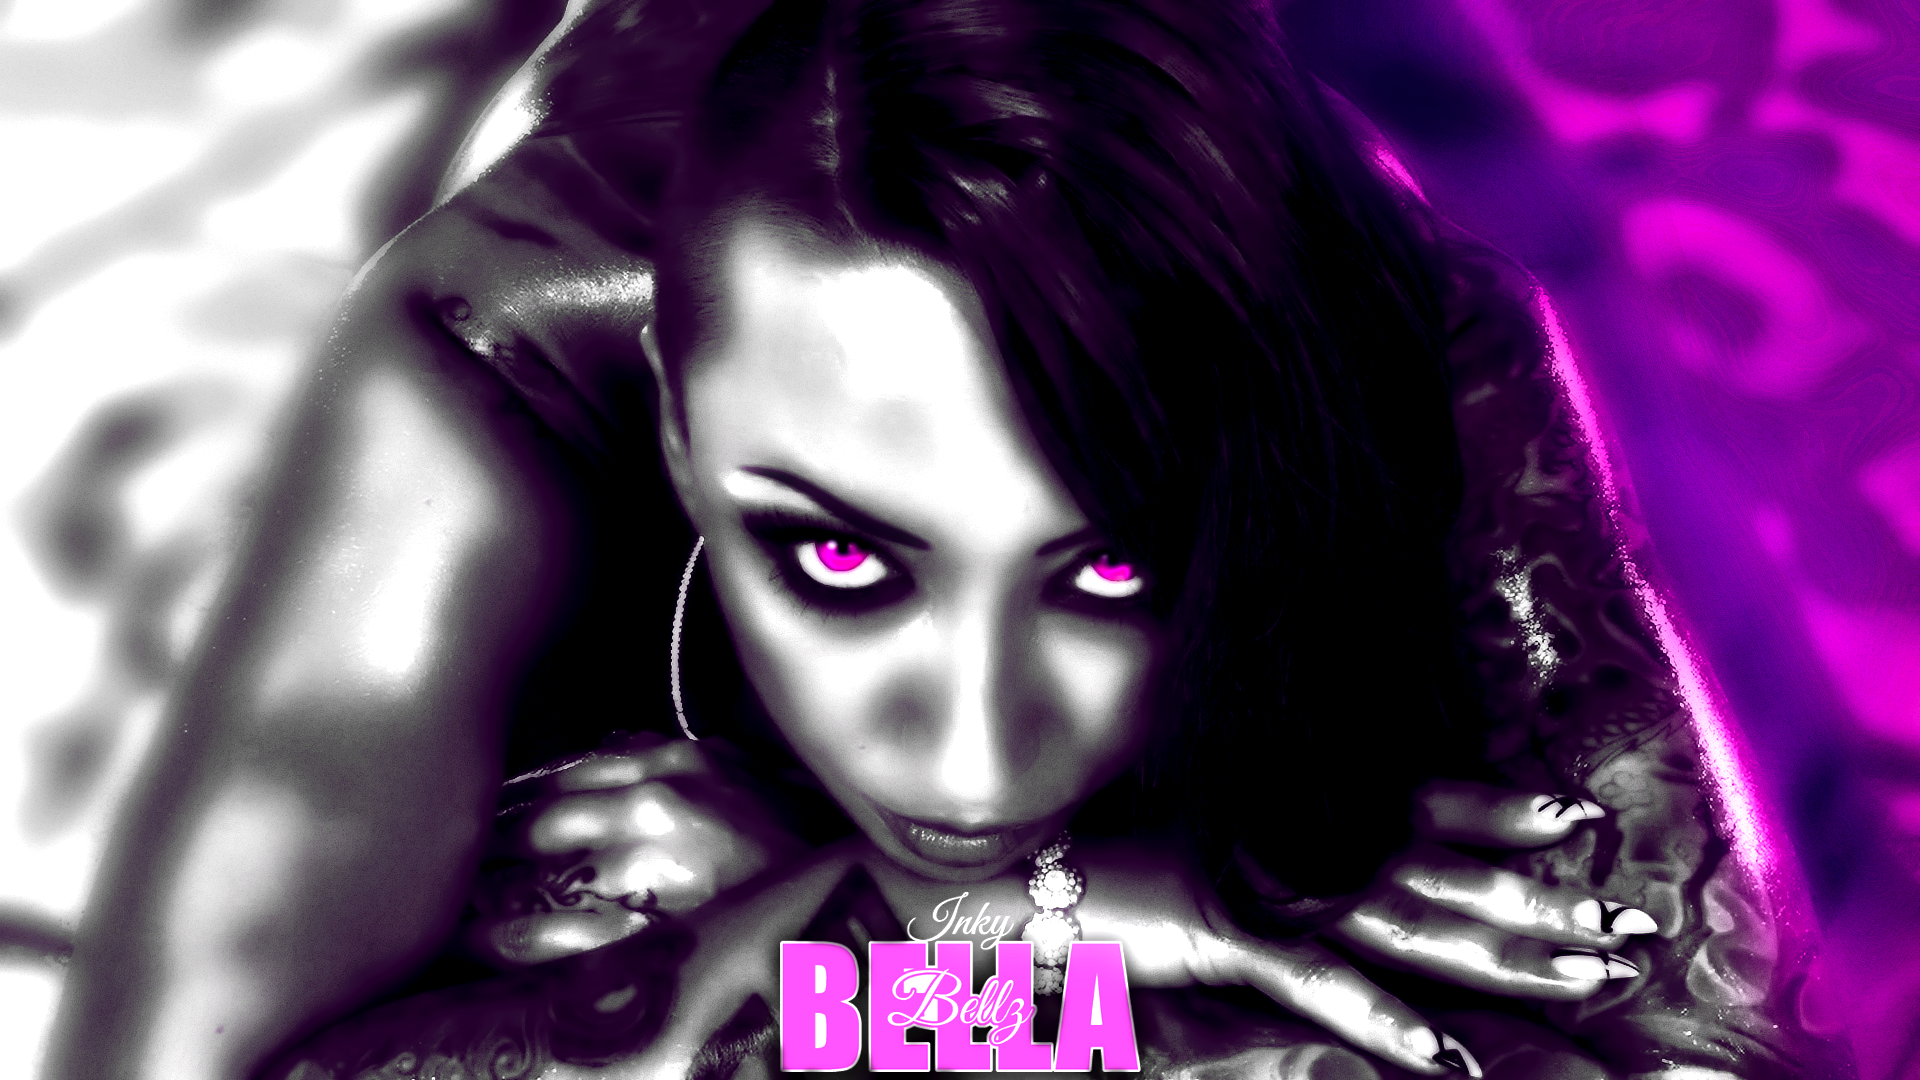 Bella Bellz Wallpaper 2 (1080p) by DarkVoidPictures on